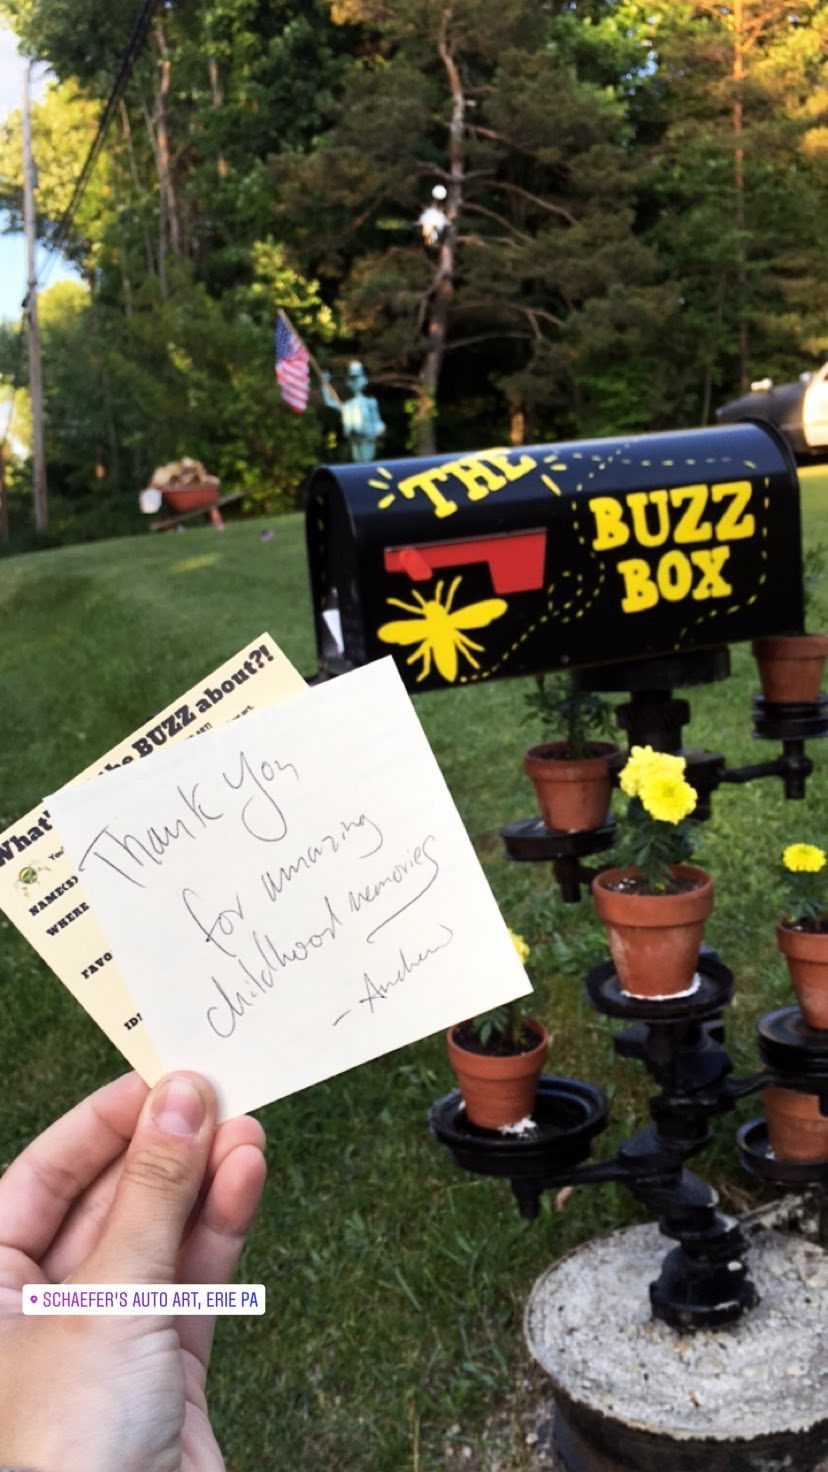 Buzz Card The Buzz Box at Schaefer's Auto Art.JPG